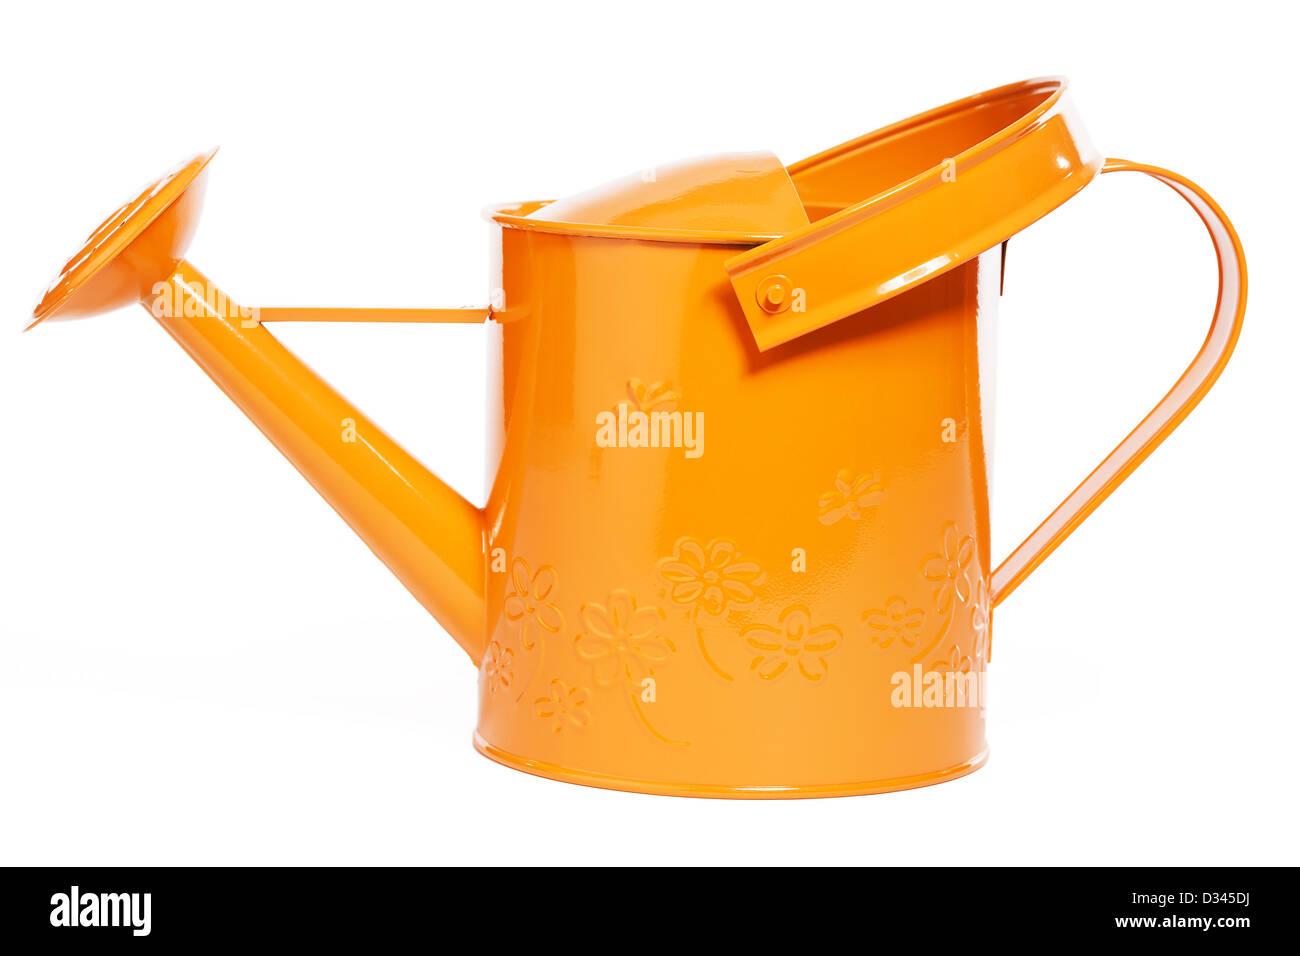 Regadera naranja sobre fondo blanco. Foto de stock